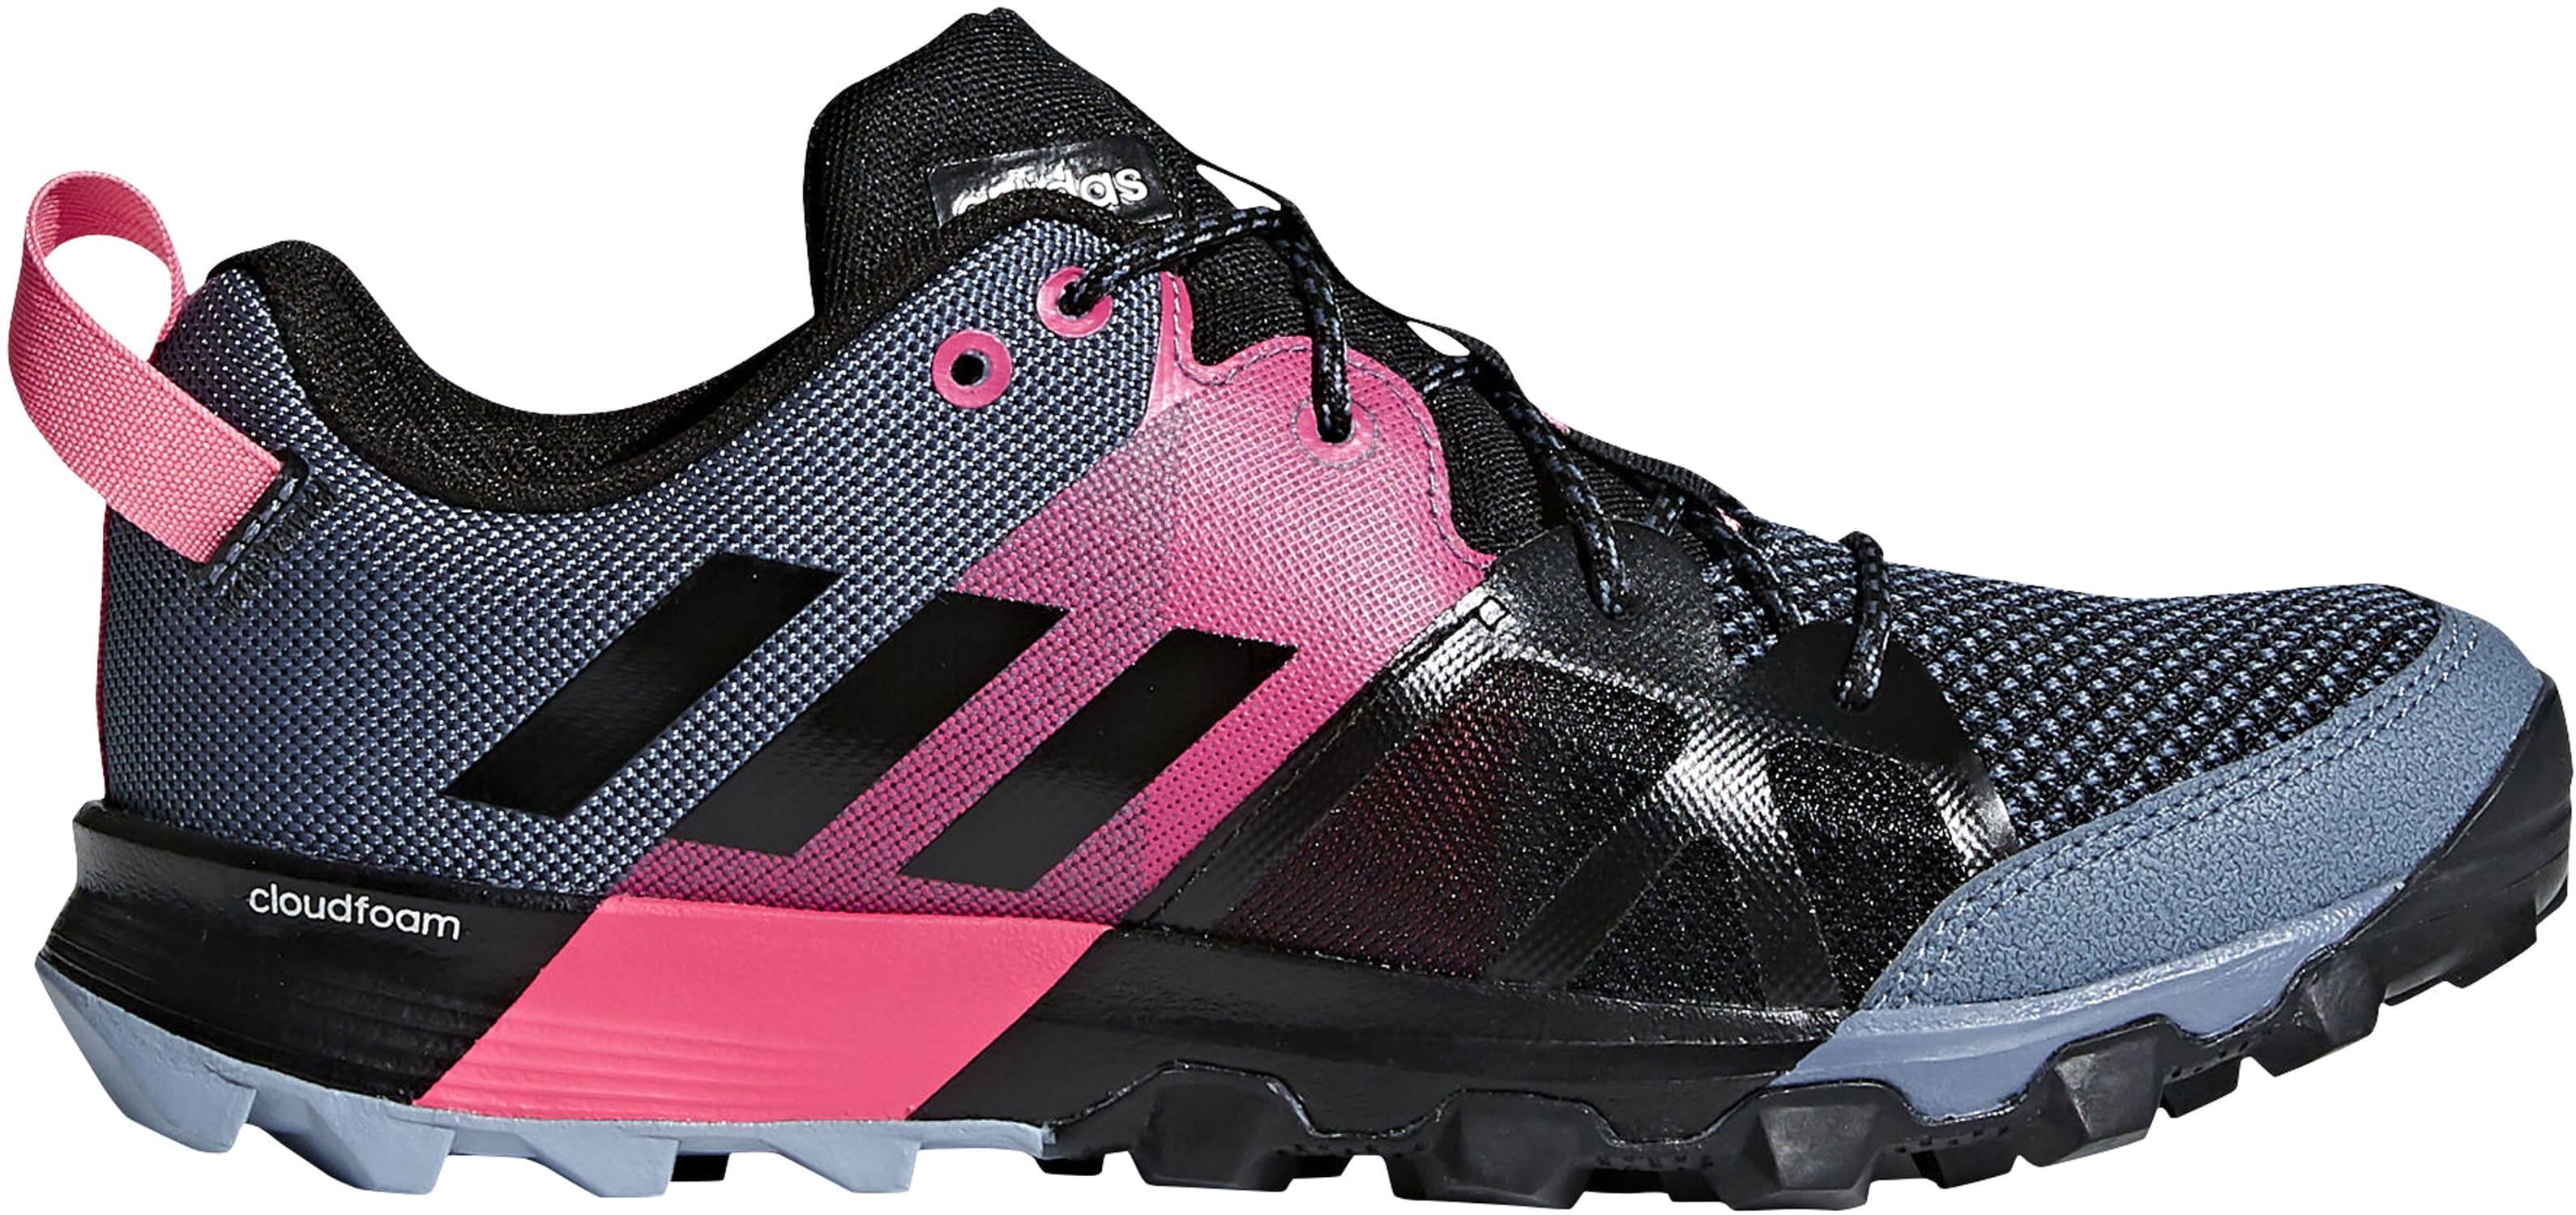 4157e2b9cc0bda Adidas Kanadia 8.1 Trail Hiking Shoes - thumbnail 1